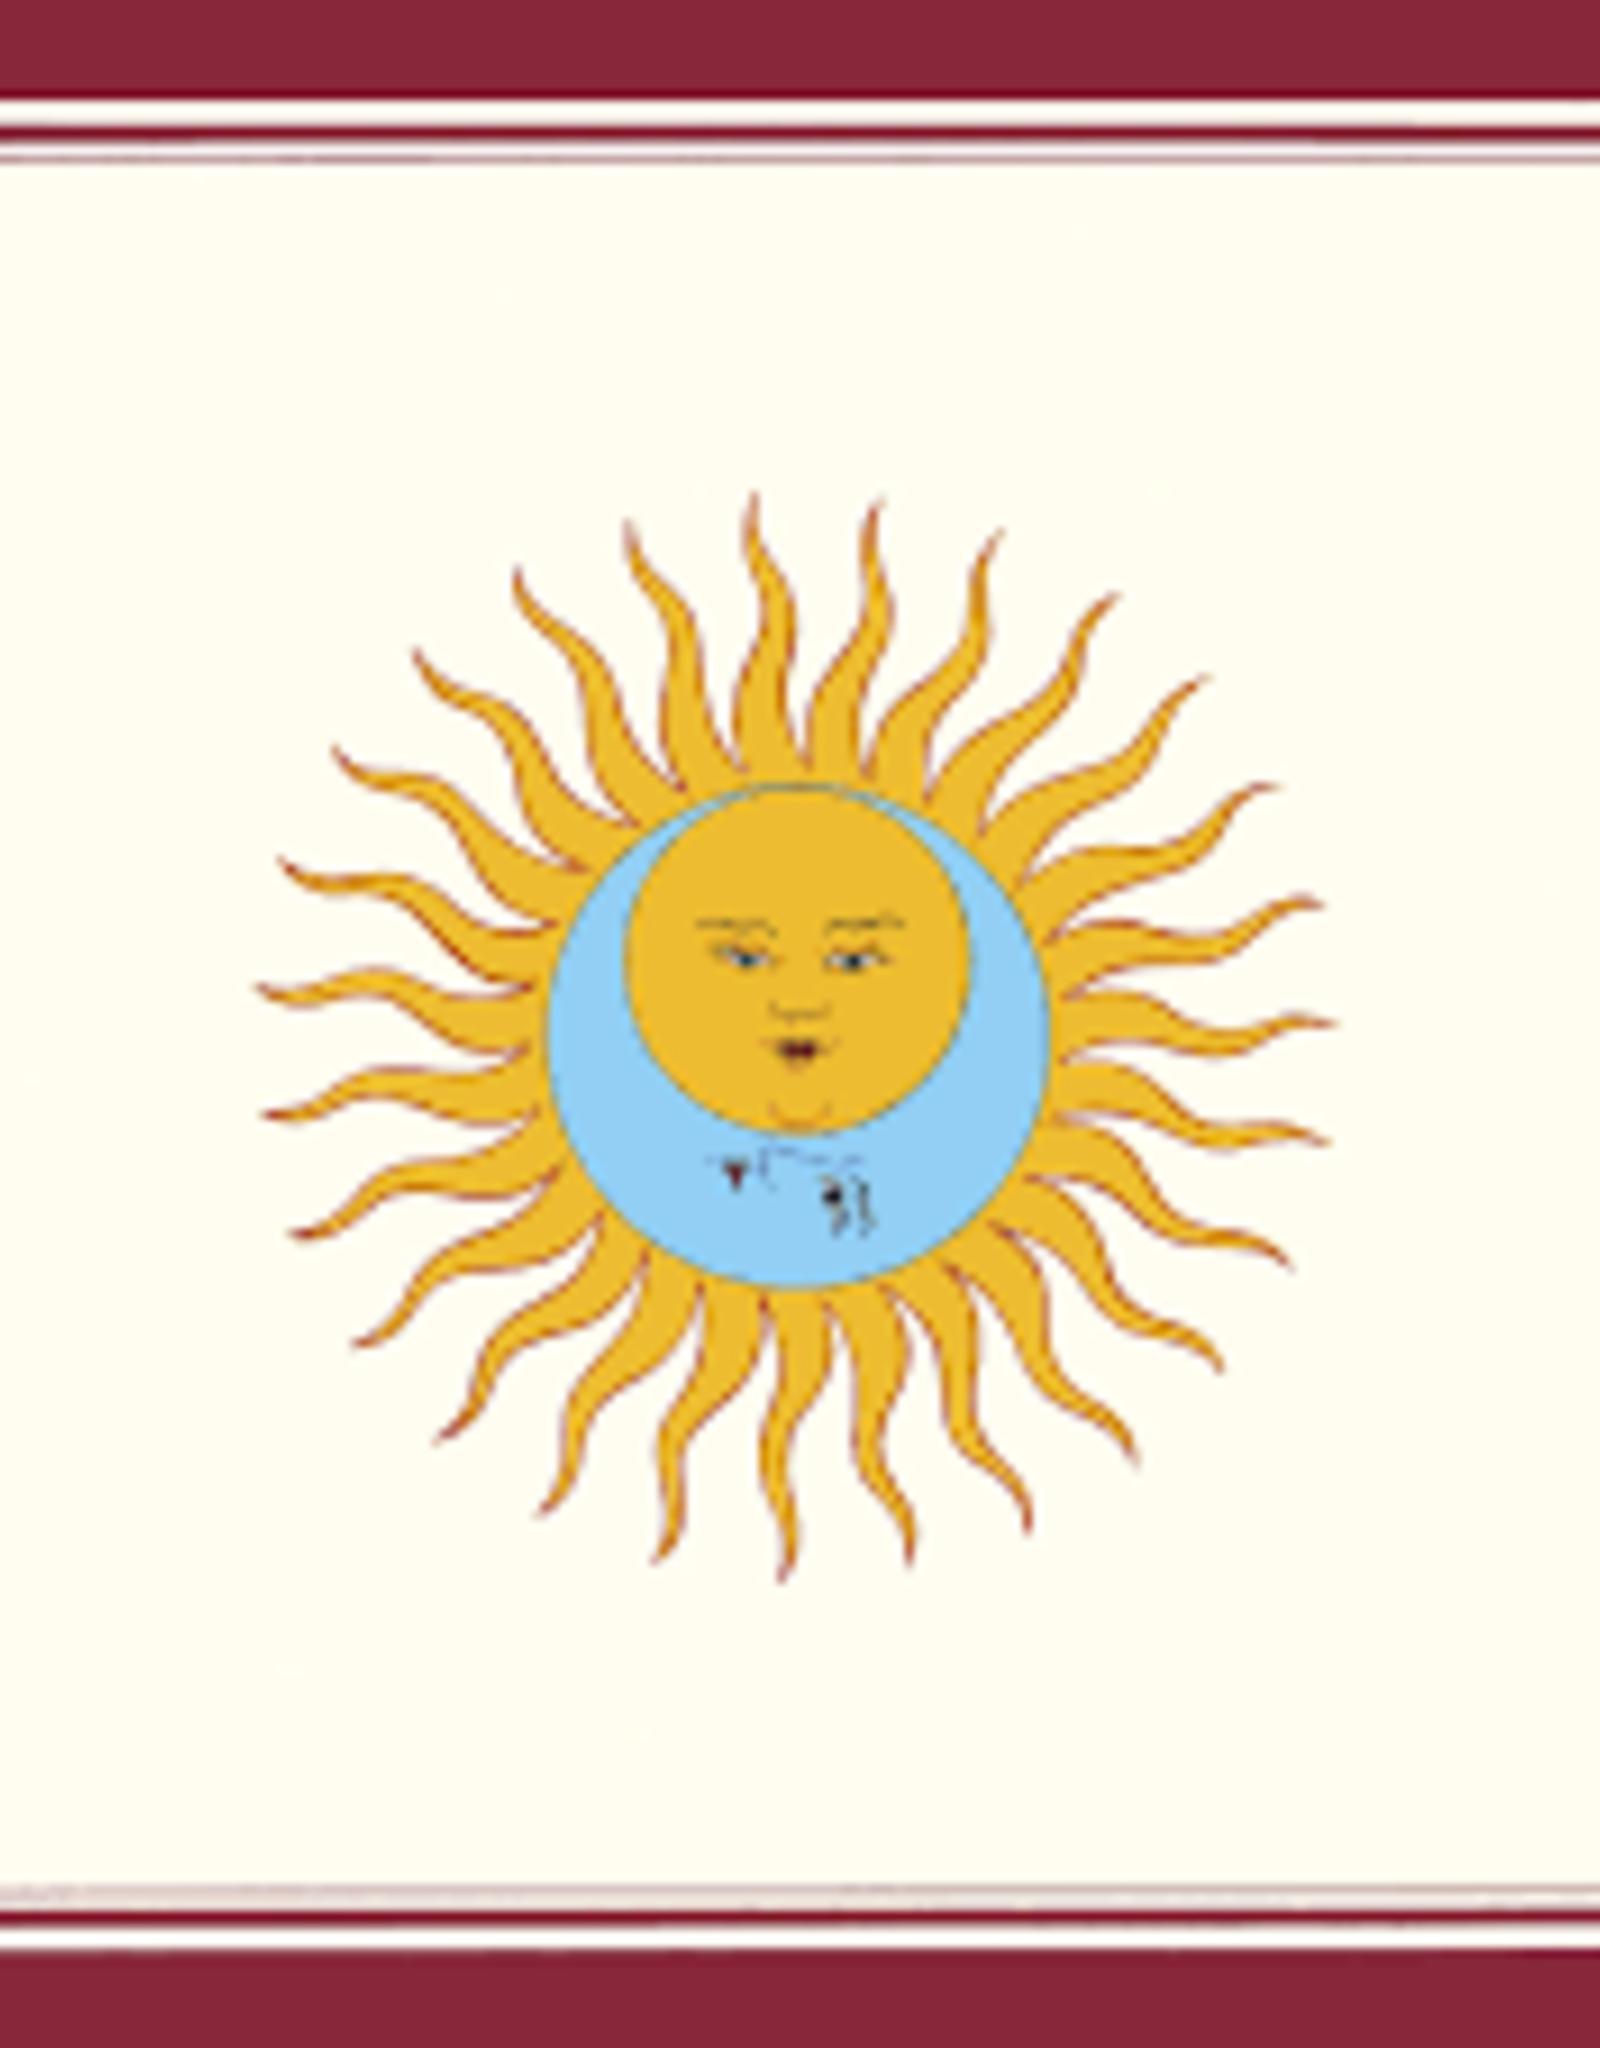 King Crimson - Larks Tongues In Aspic (Remixed By Steven Wilson & Robert Fripp) (Ltd200gm Vinyl)